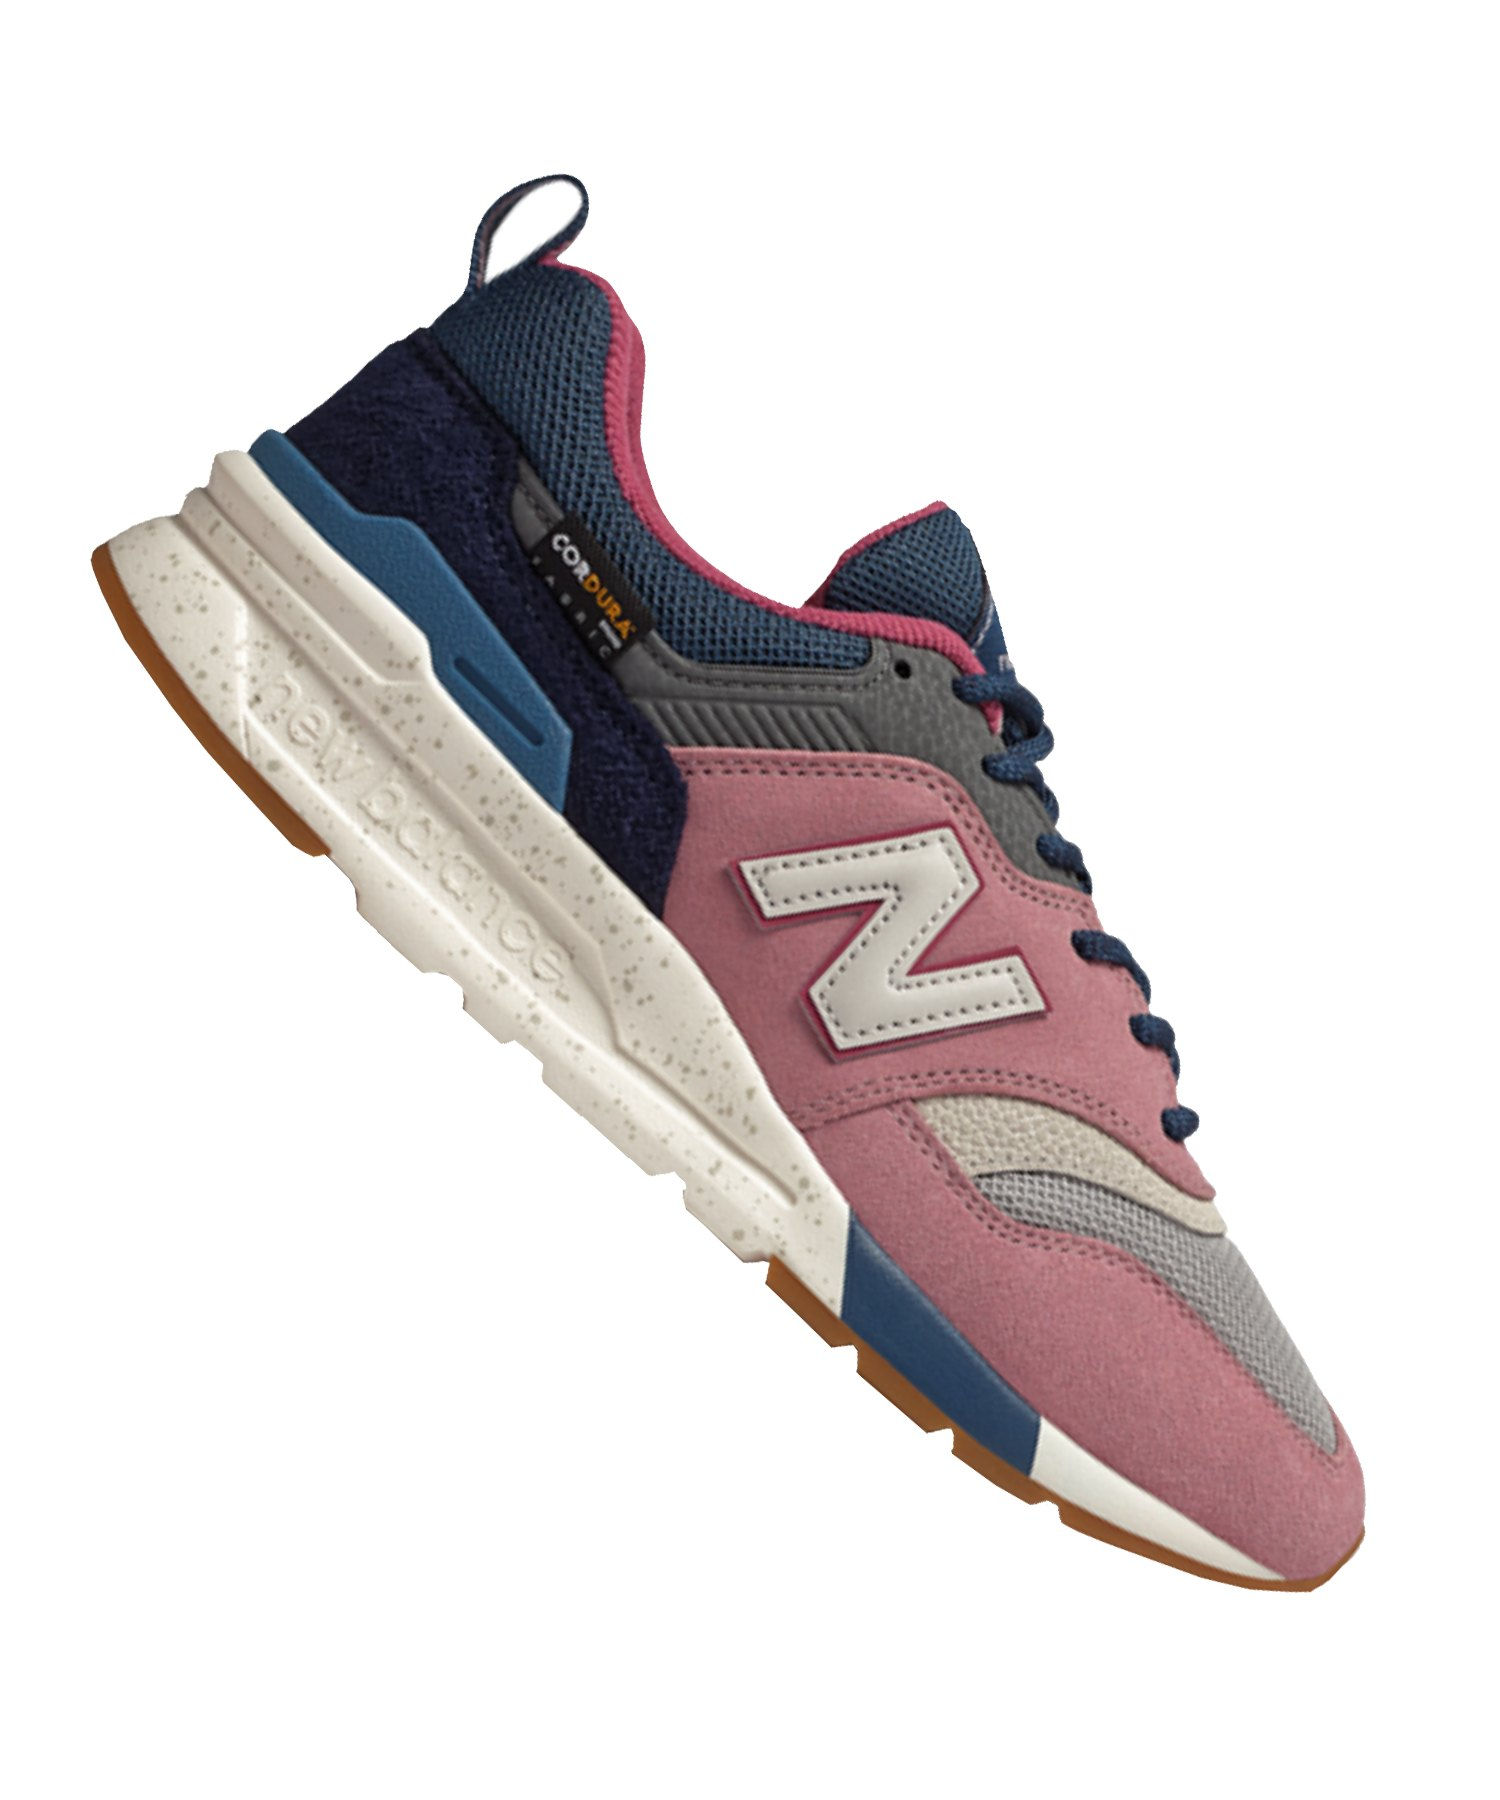 New Balance CW997 B Sneaker Damen Pink F13 - pink